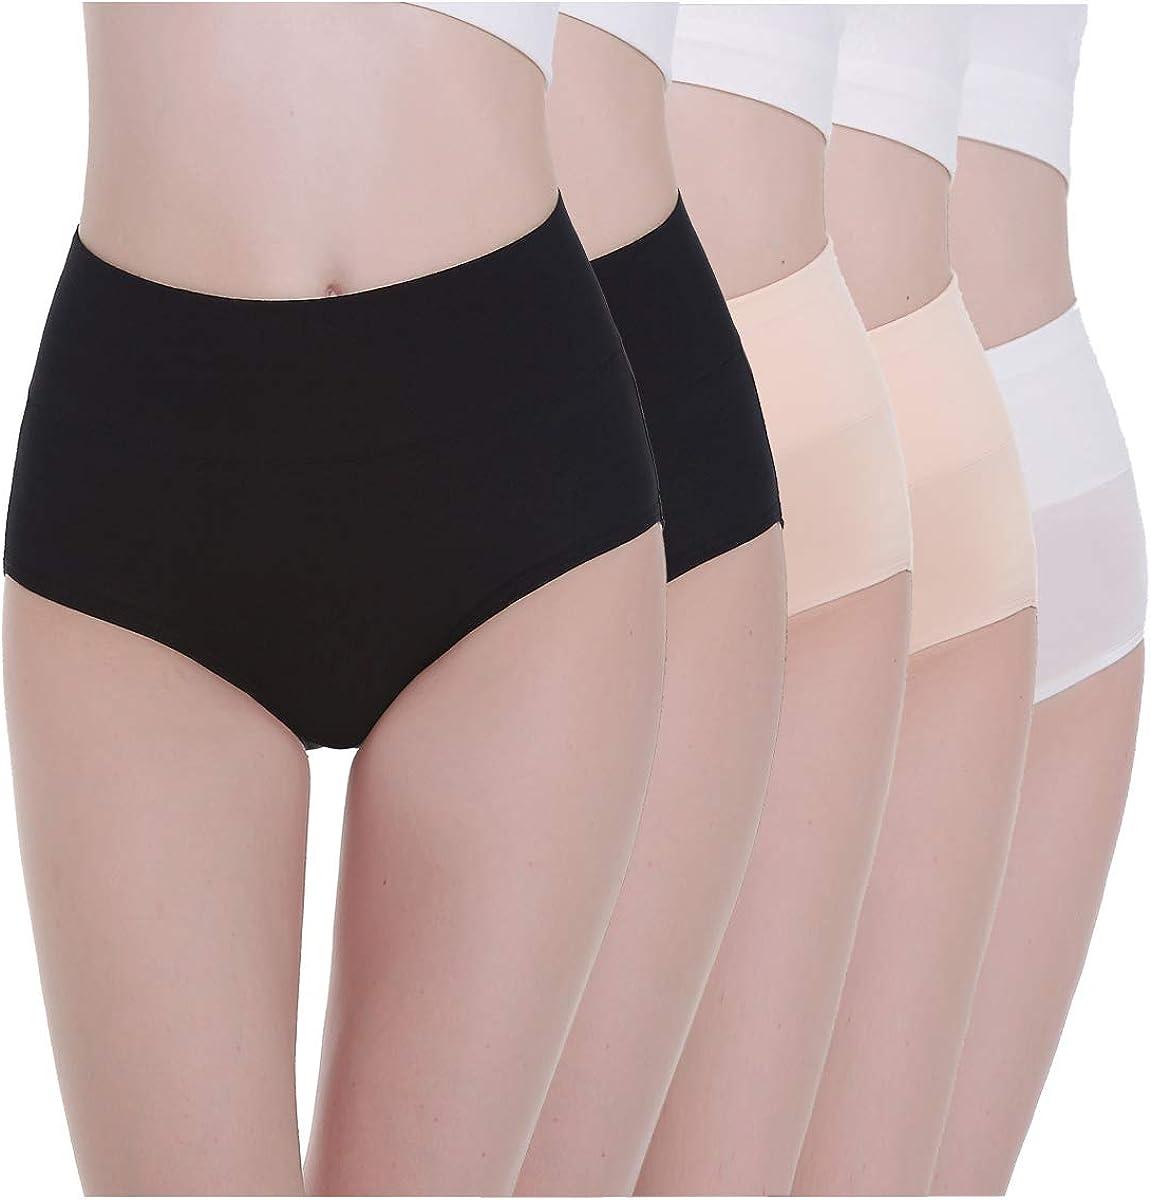 TIFIY Regalo Braguita de Talle Alto Algod/ón para Mujer Pack de 1 Algod/ón Bragas de Cintura Alta C/ómodo Talla